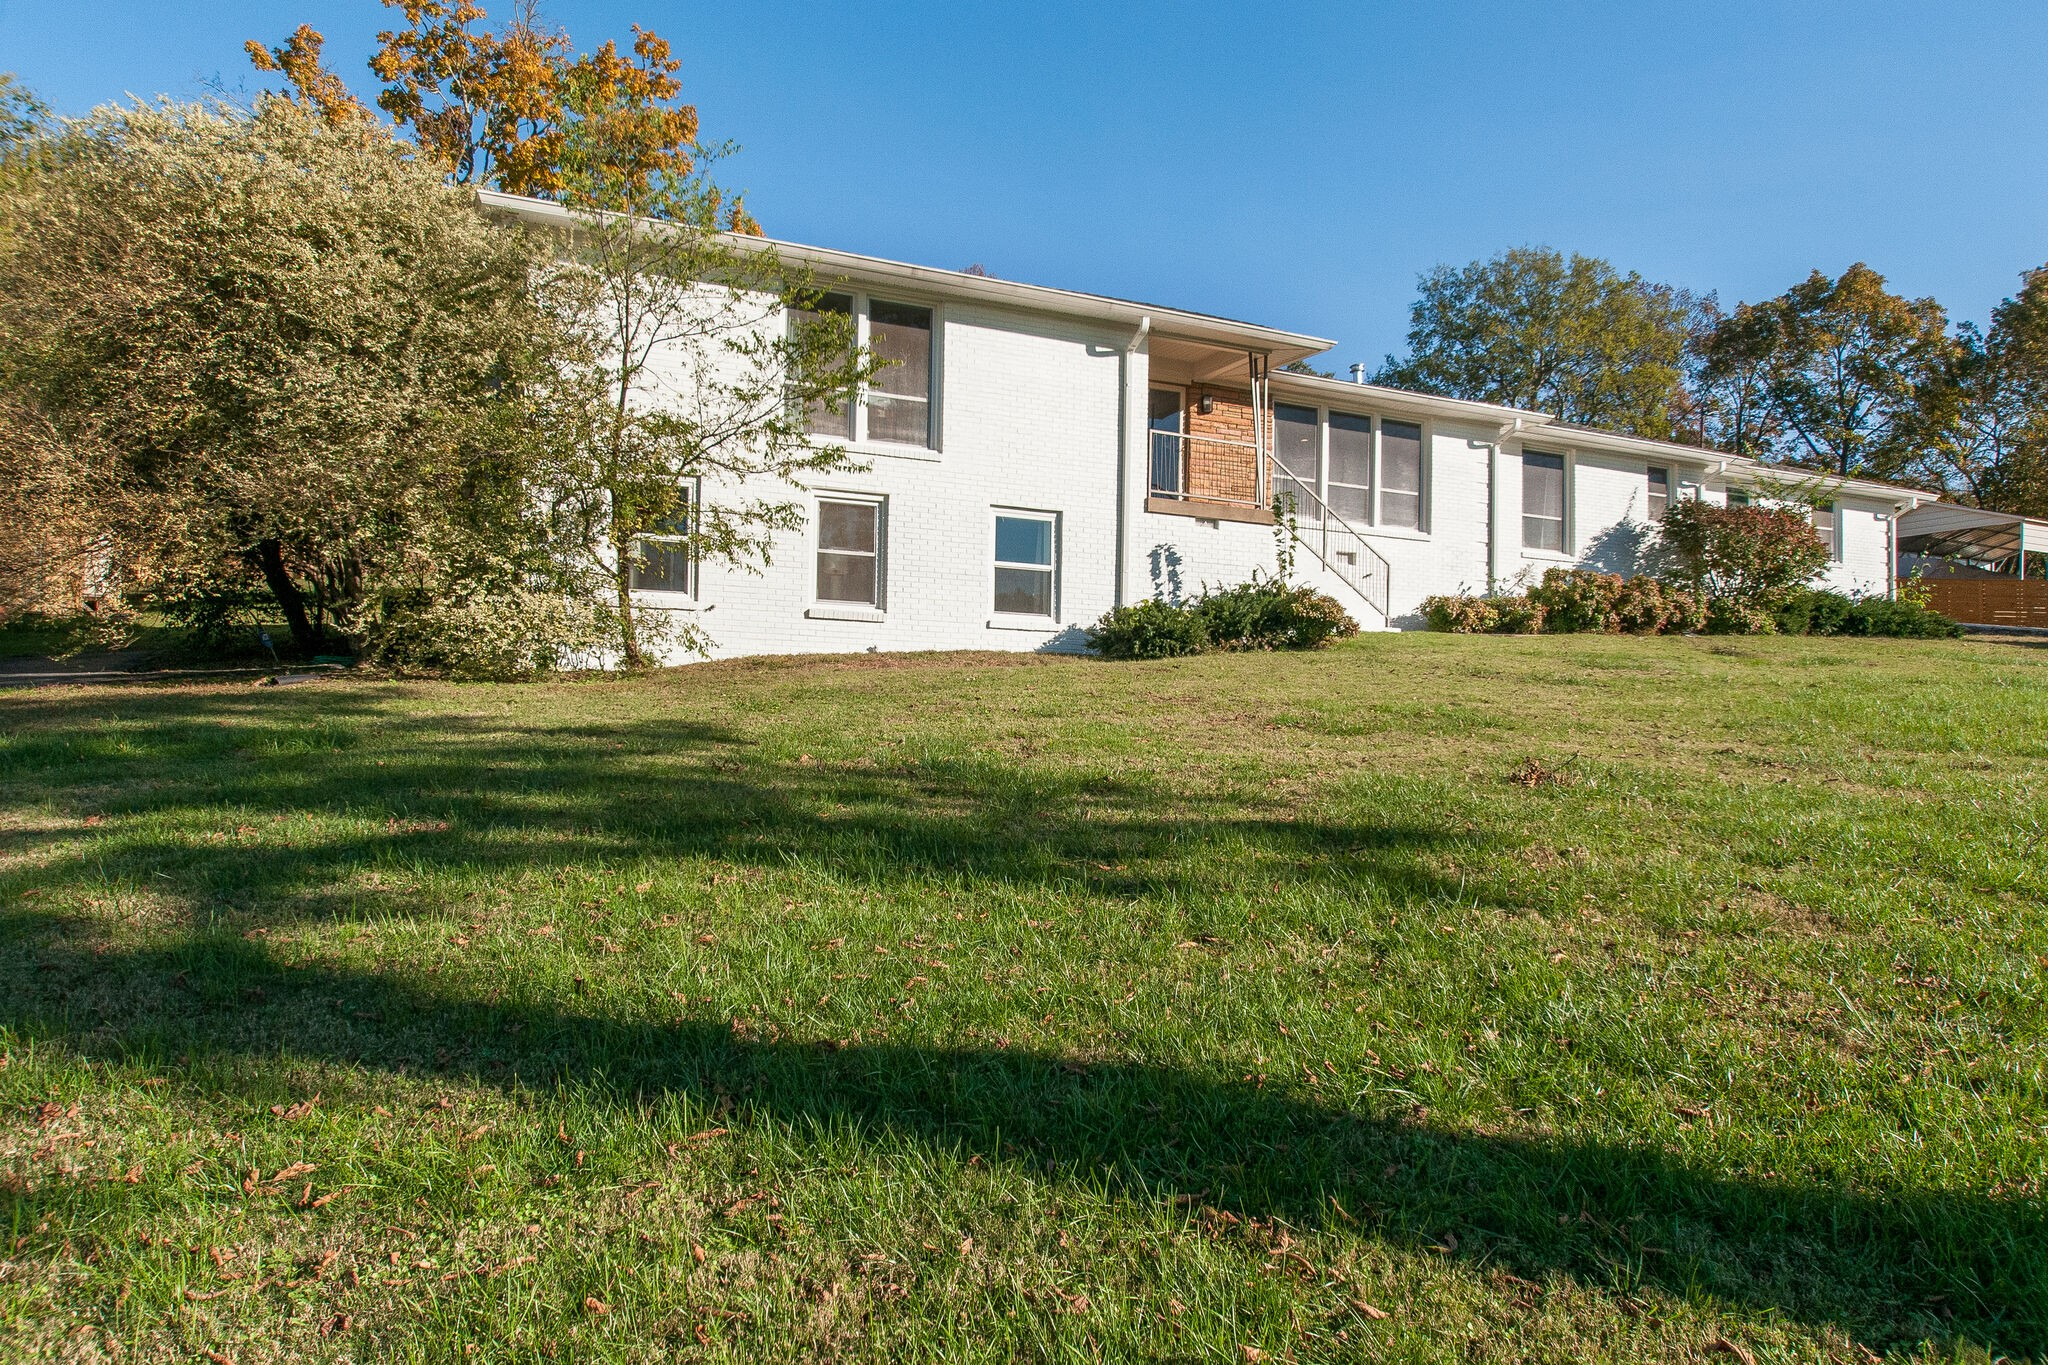 3208 Knobview Dr Property Photo - Nashville, TN real estate listing